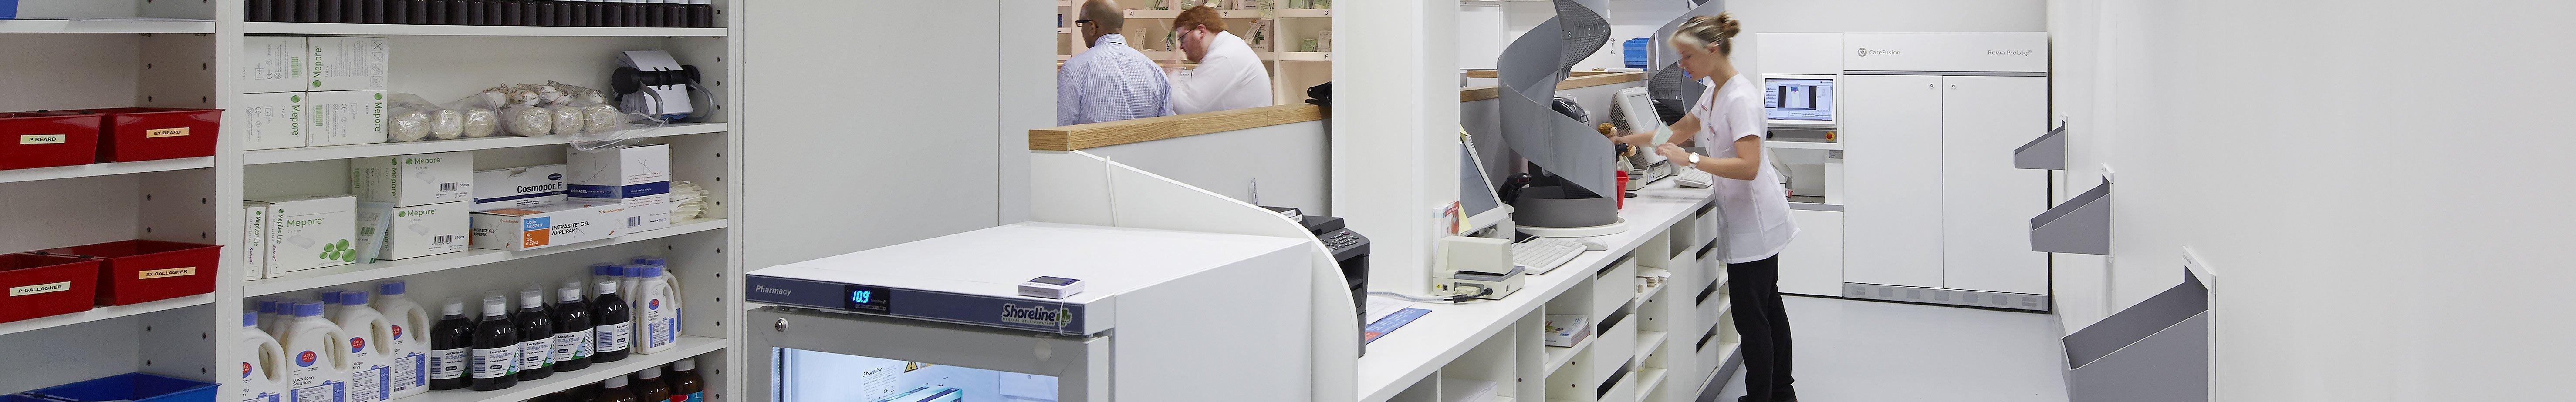 laboratory-view